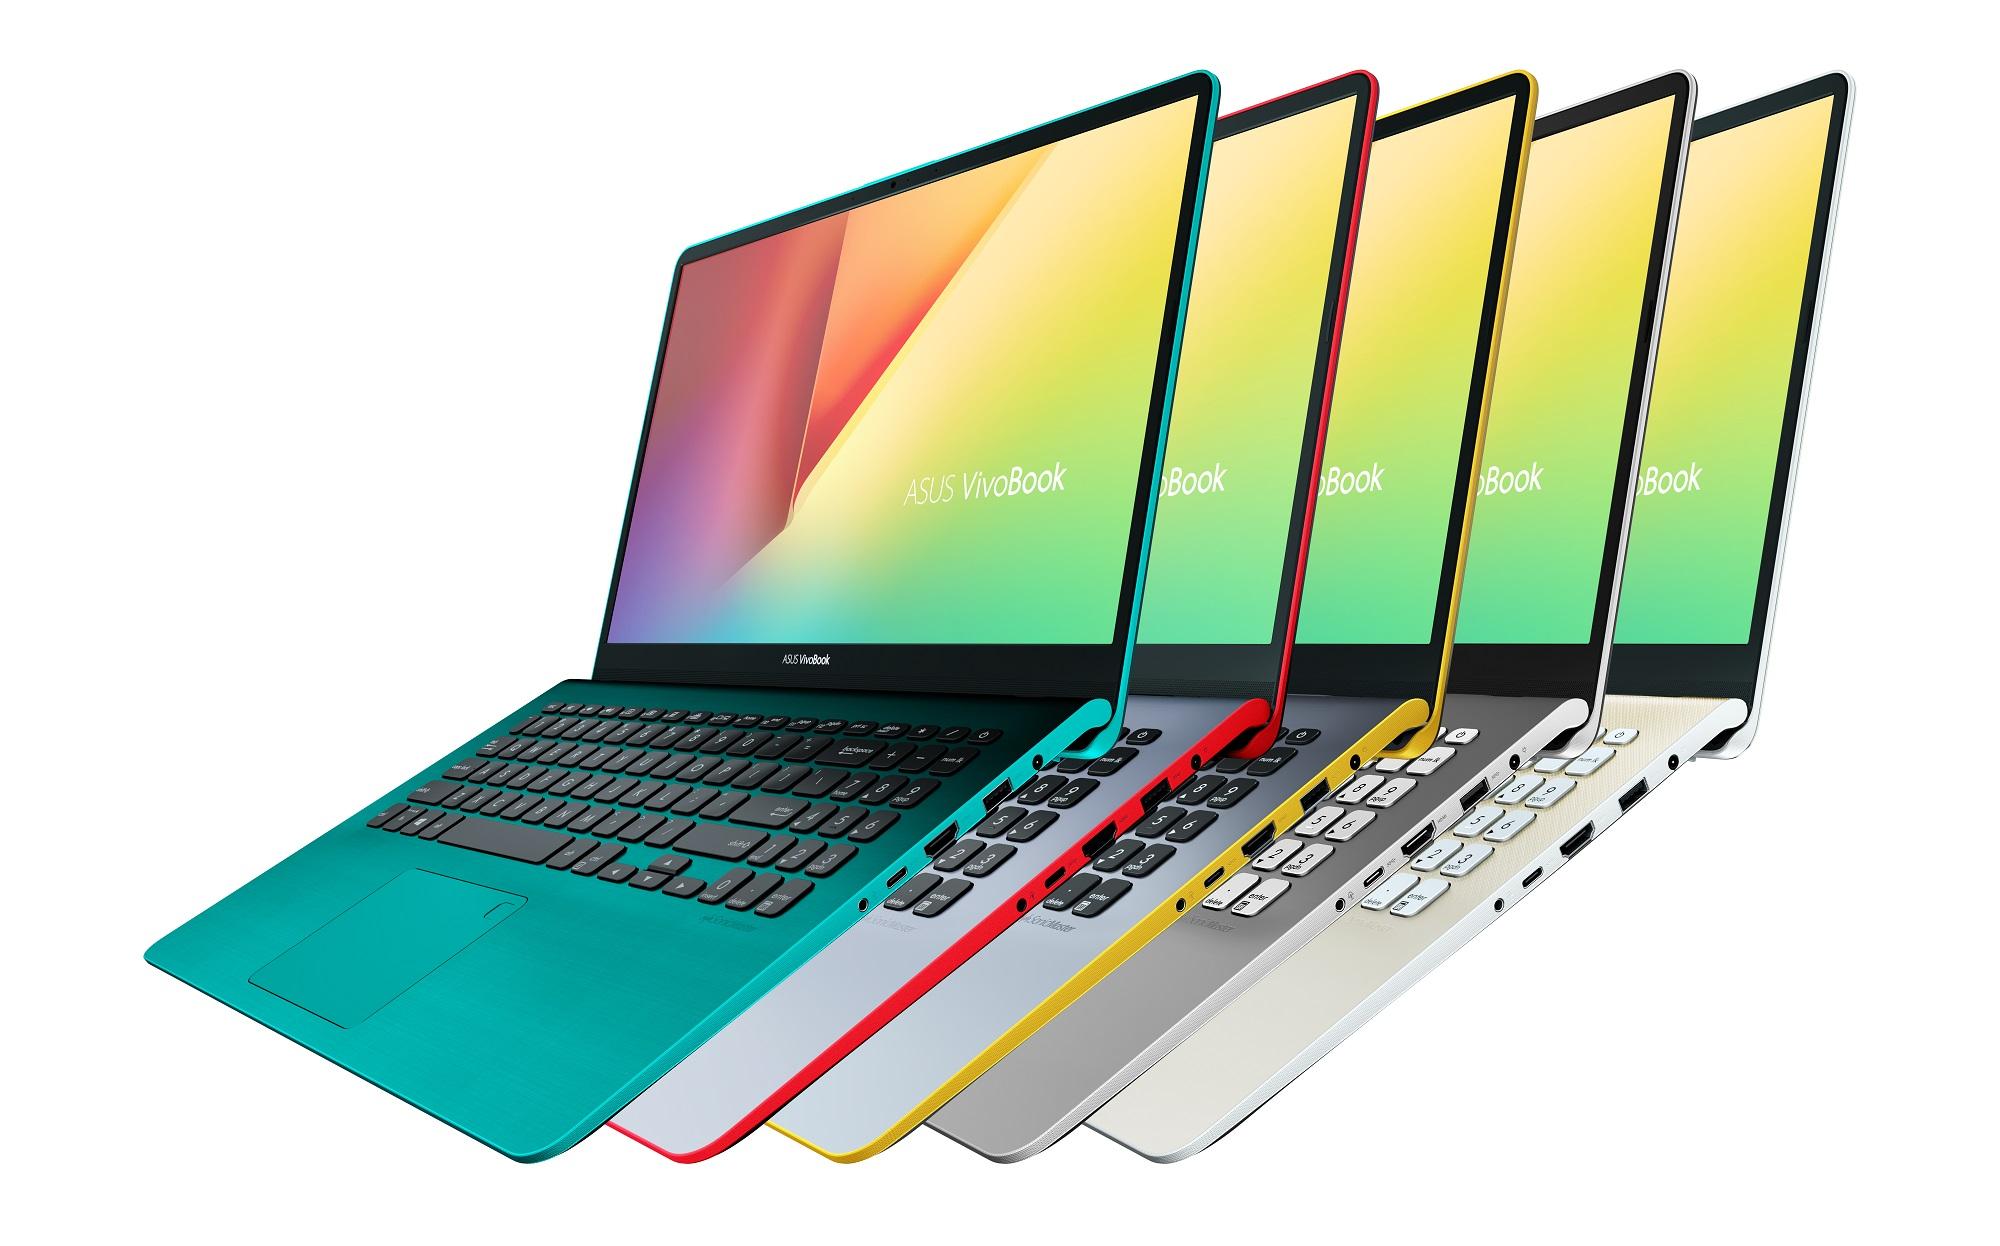 ASUS VivoBook S / ASUSTeK Computer Inc.